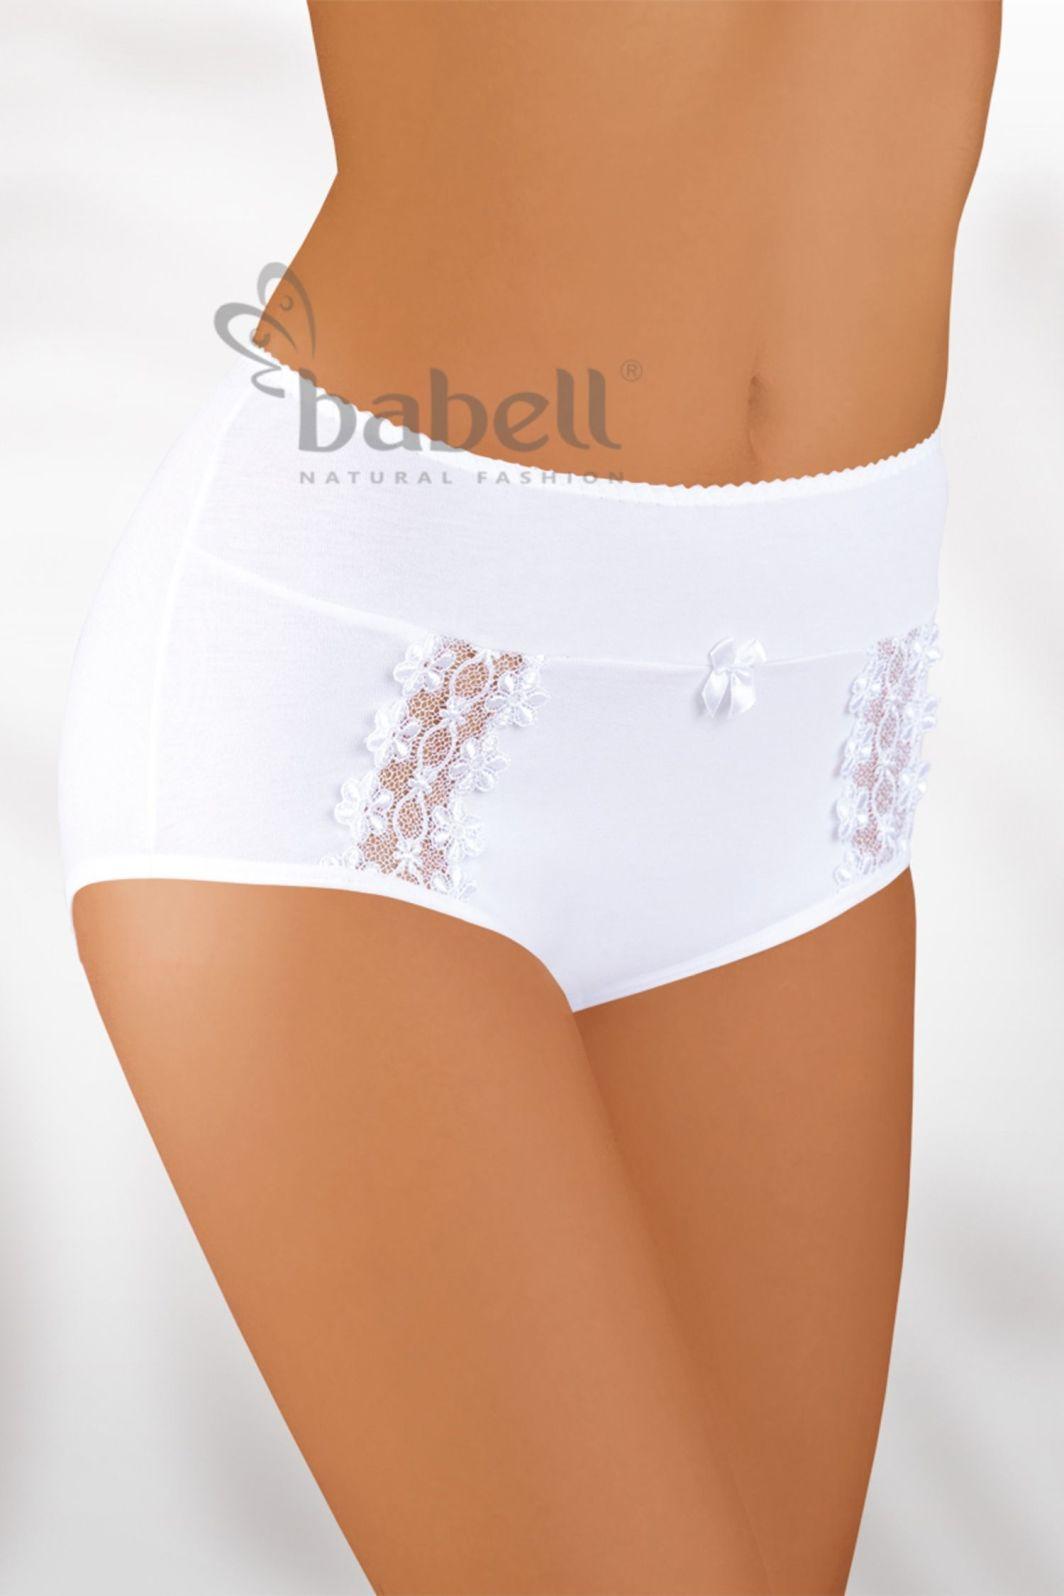 Babell Figi damskie BBL-005 plus białe r. 4XL 1